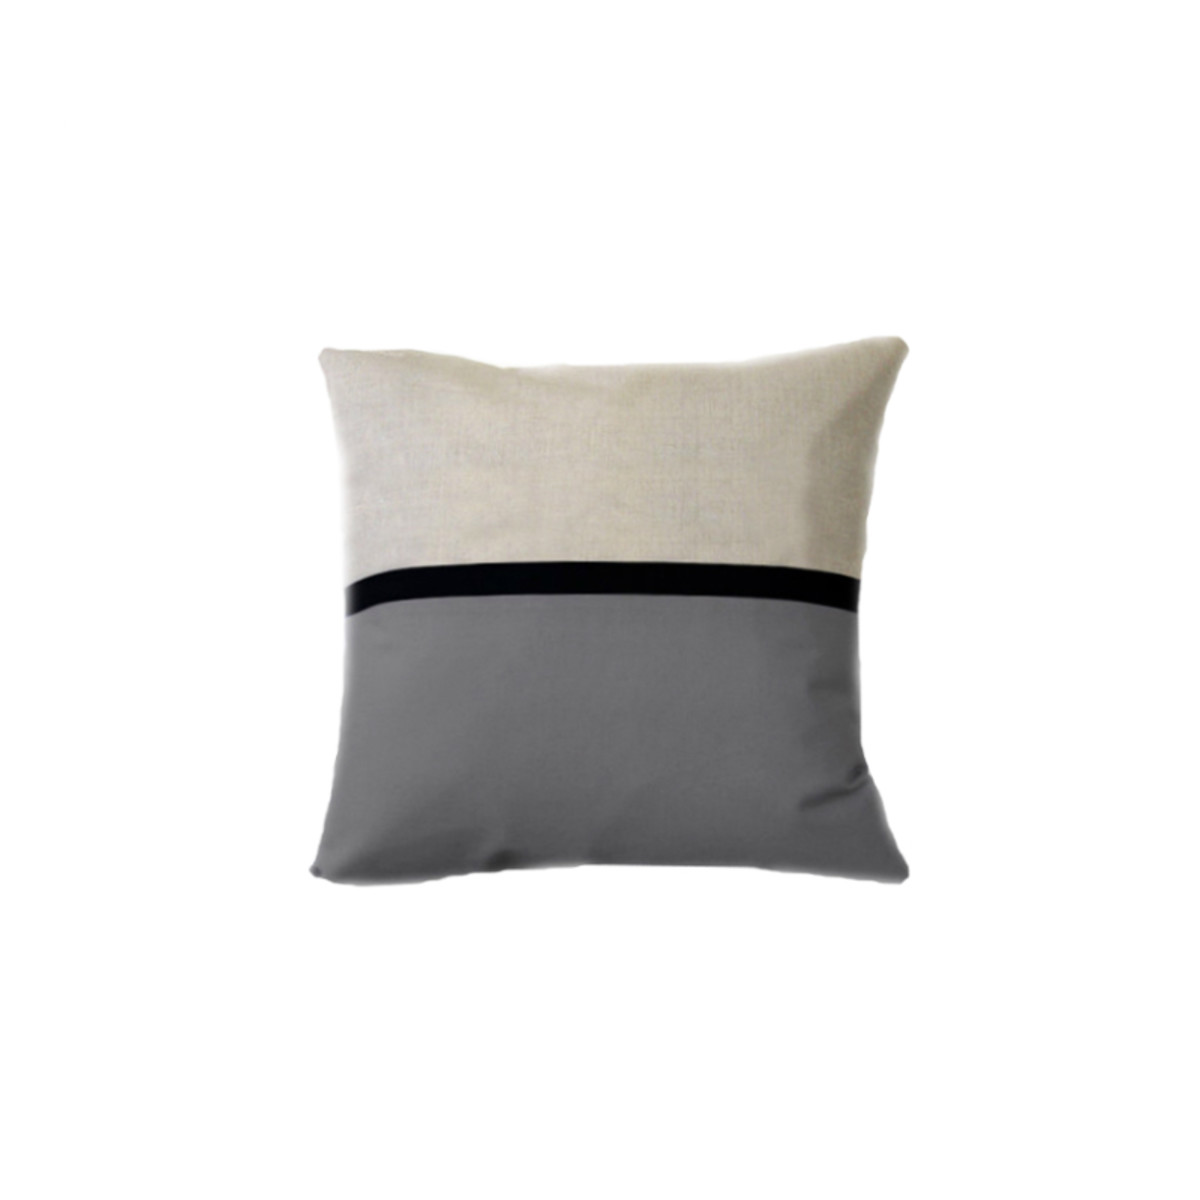 Striped-Linen-Pillow-3-TRNK